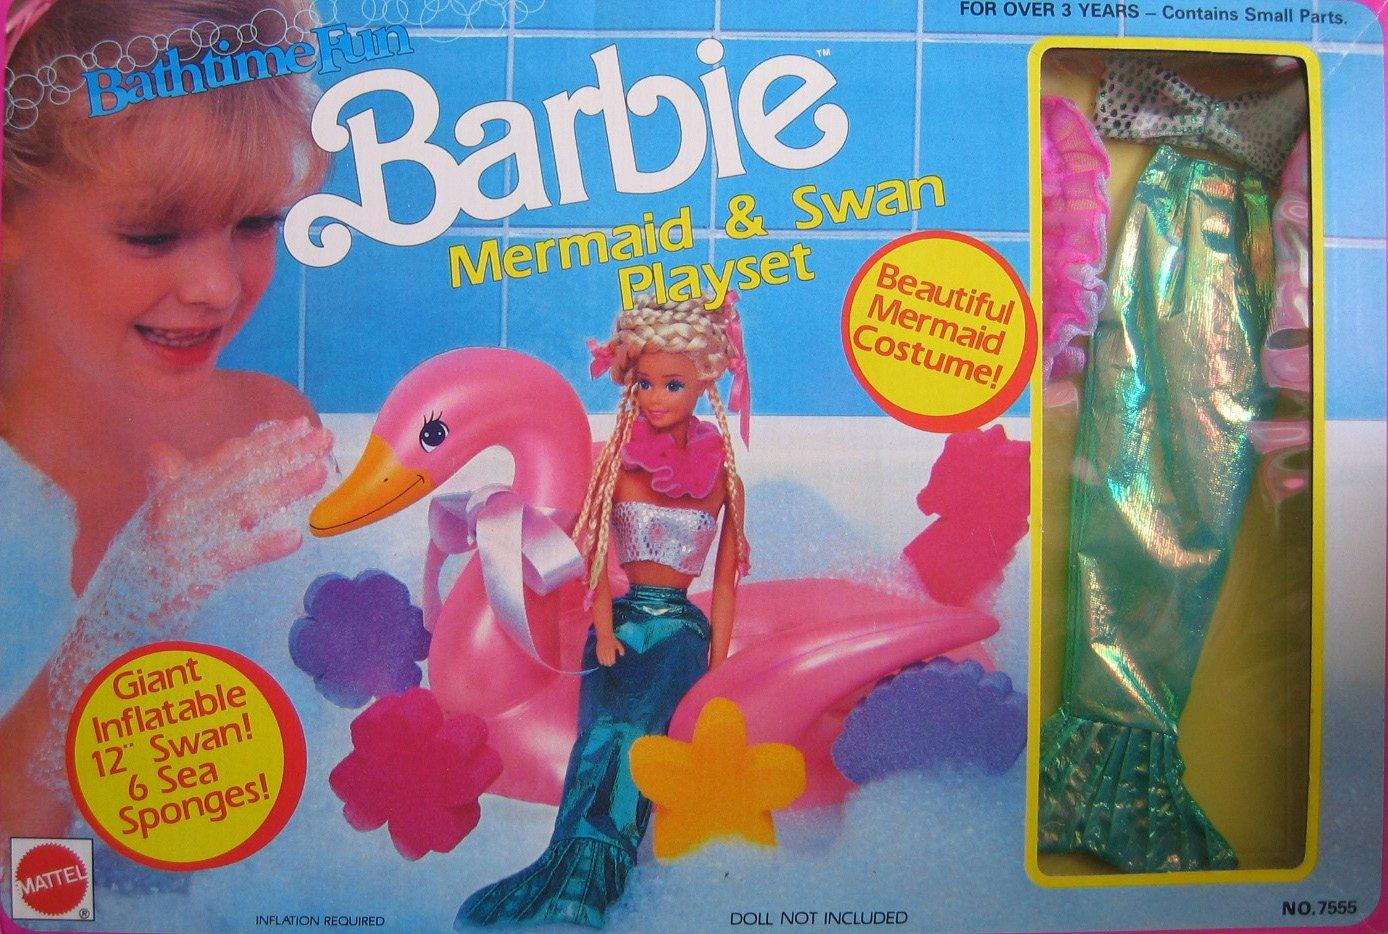 Bathtime Fun BARBIE Mermaid & Swan Playset w Mermaid Costume (1990 Arco Toys, Mattel)